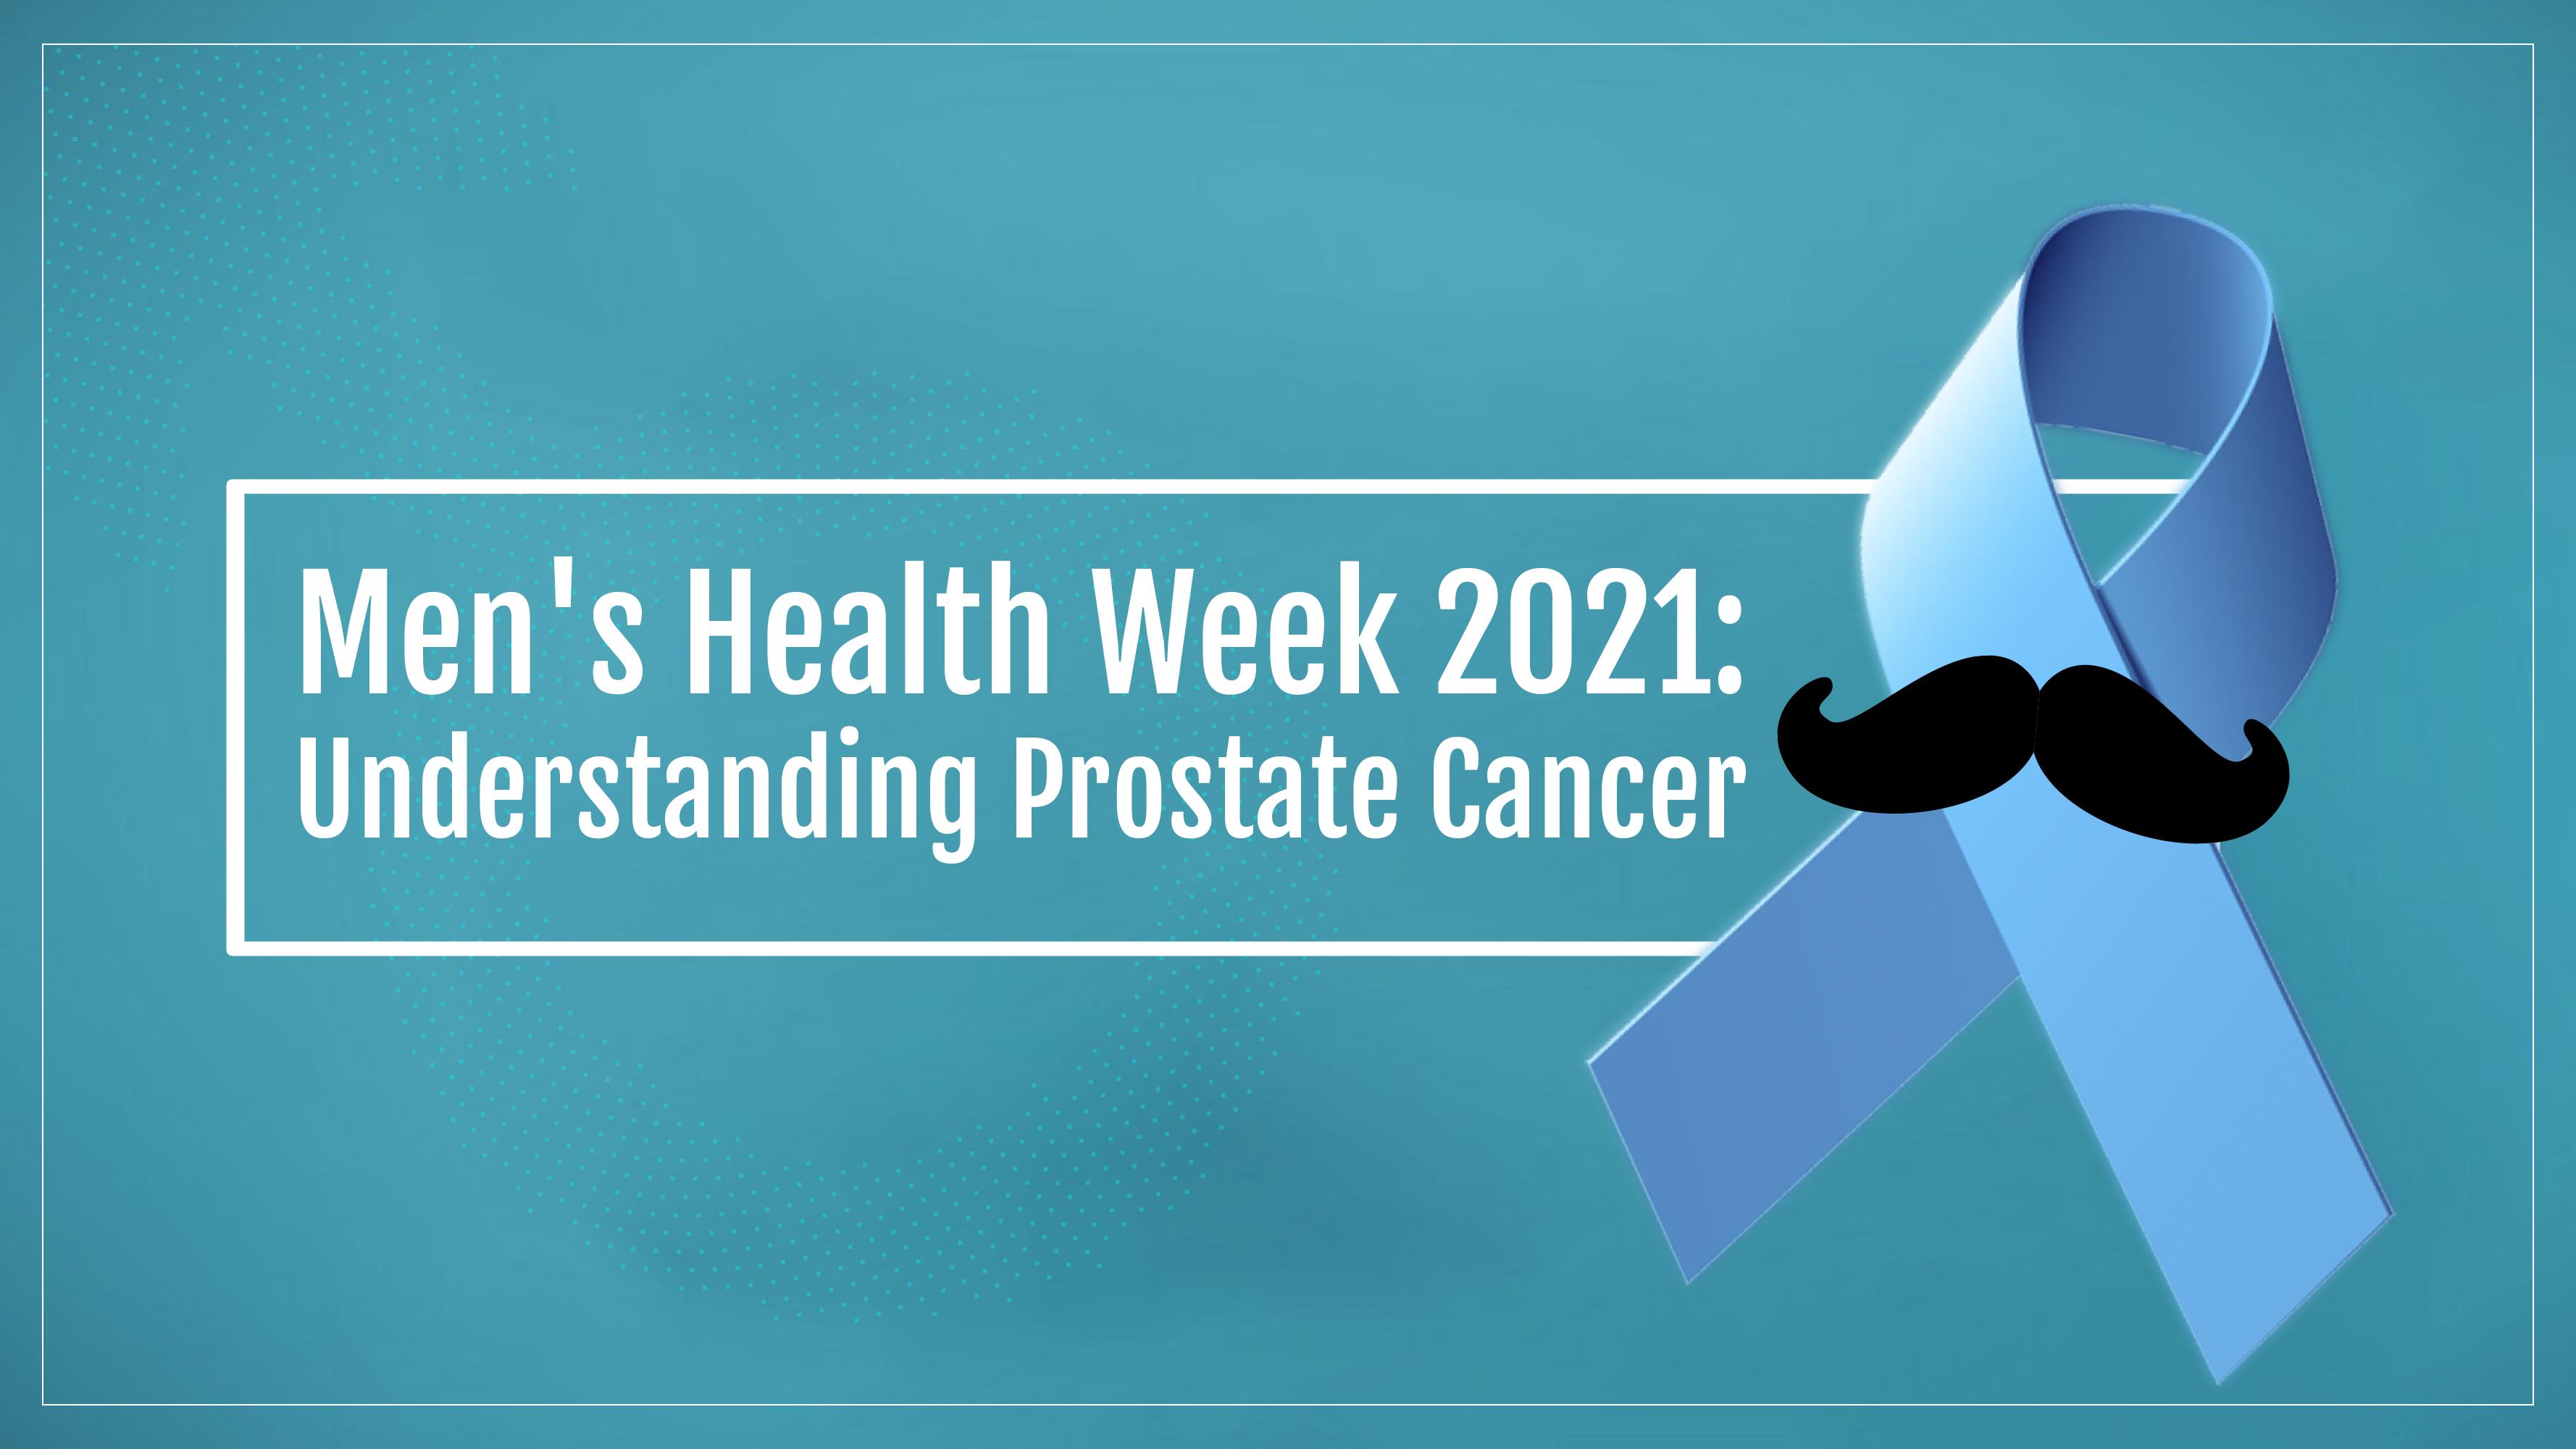 Prostate Cancer: Risk Factors, Symptoms and Prevention